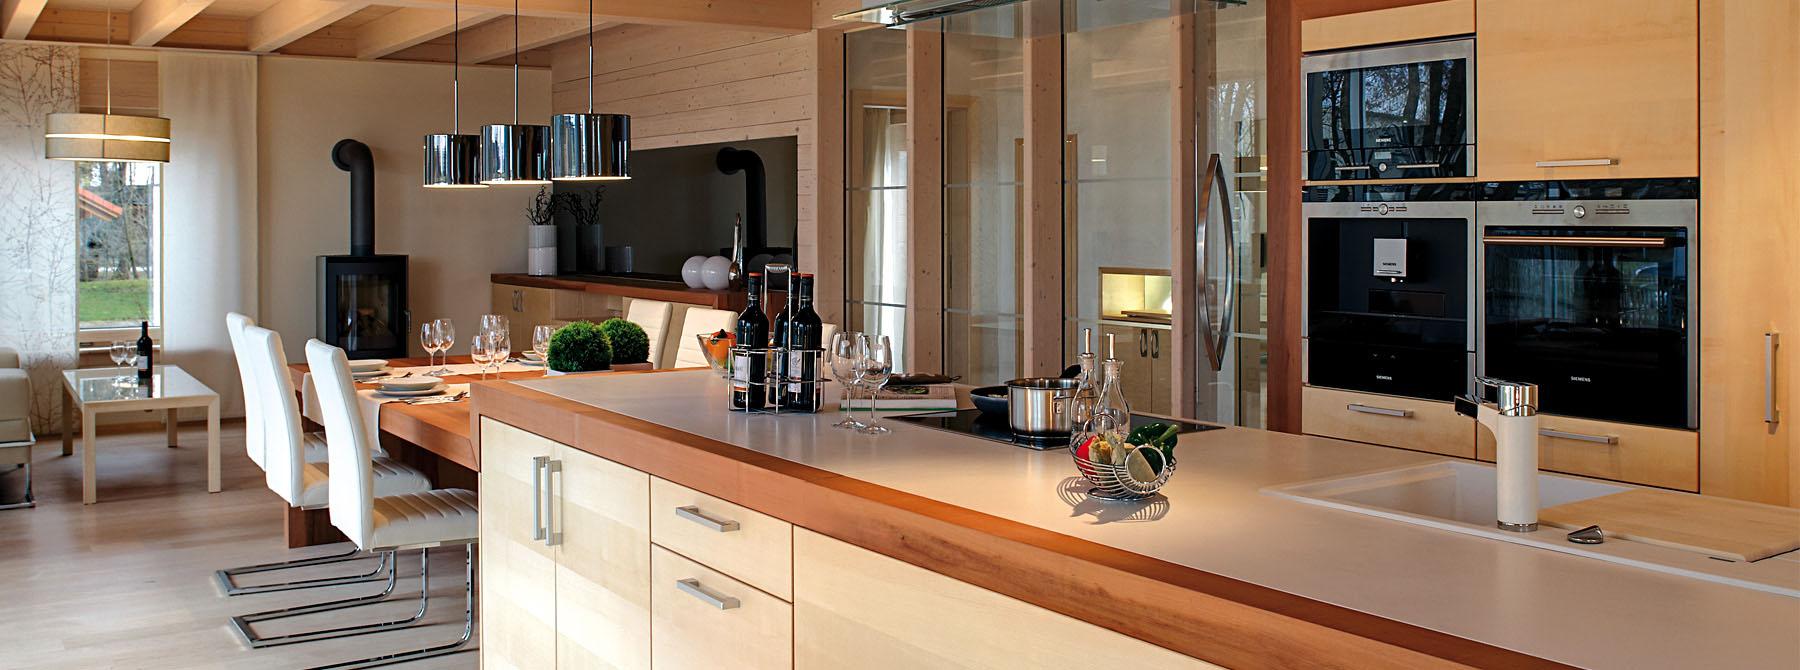 k chen und k chenm bel aus massivholz. Black Bedroom Furniture Sets. Home Design Ideas